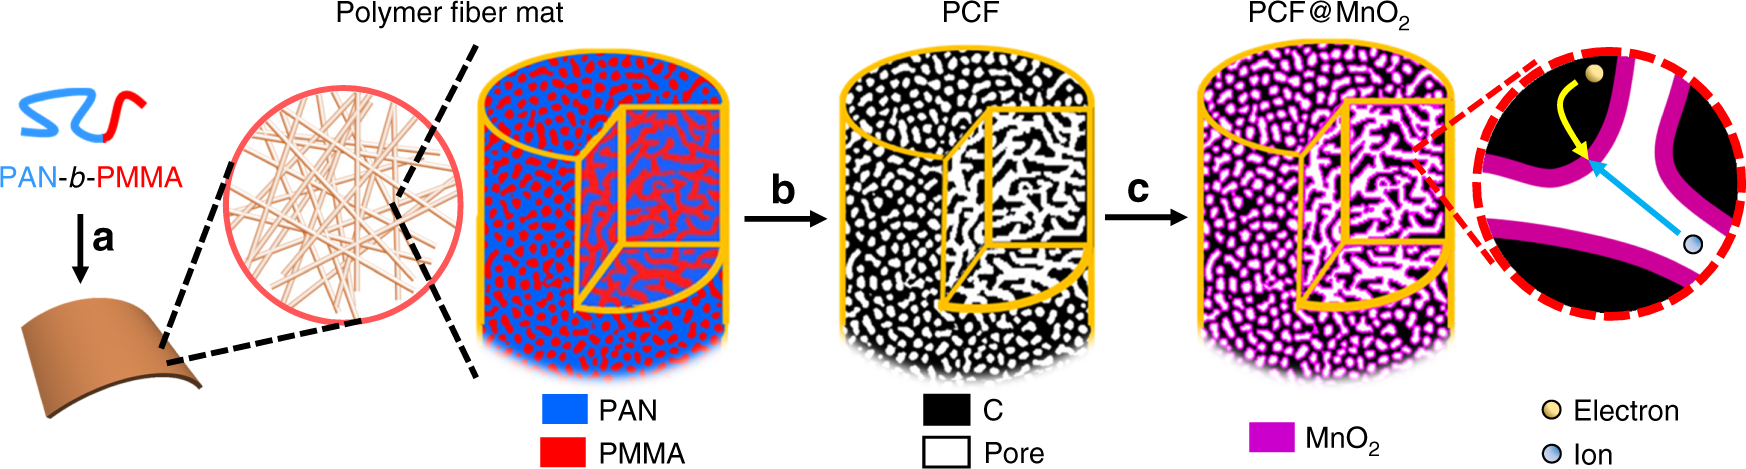 Block copolymer derived uniform mesopores enable ultrafast